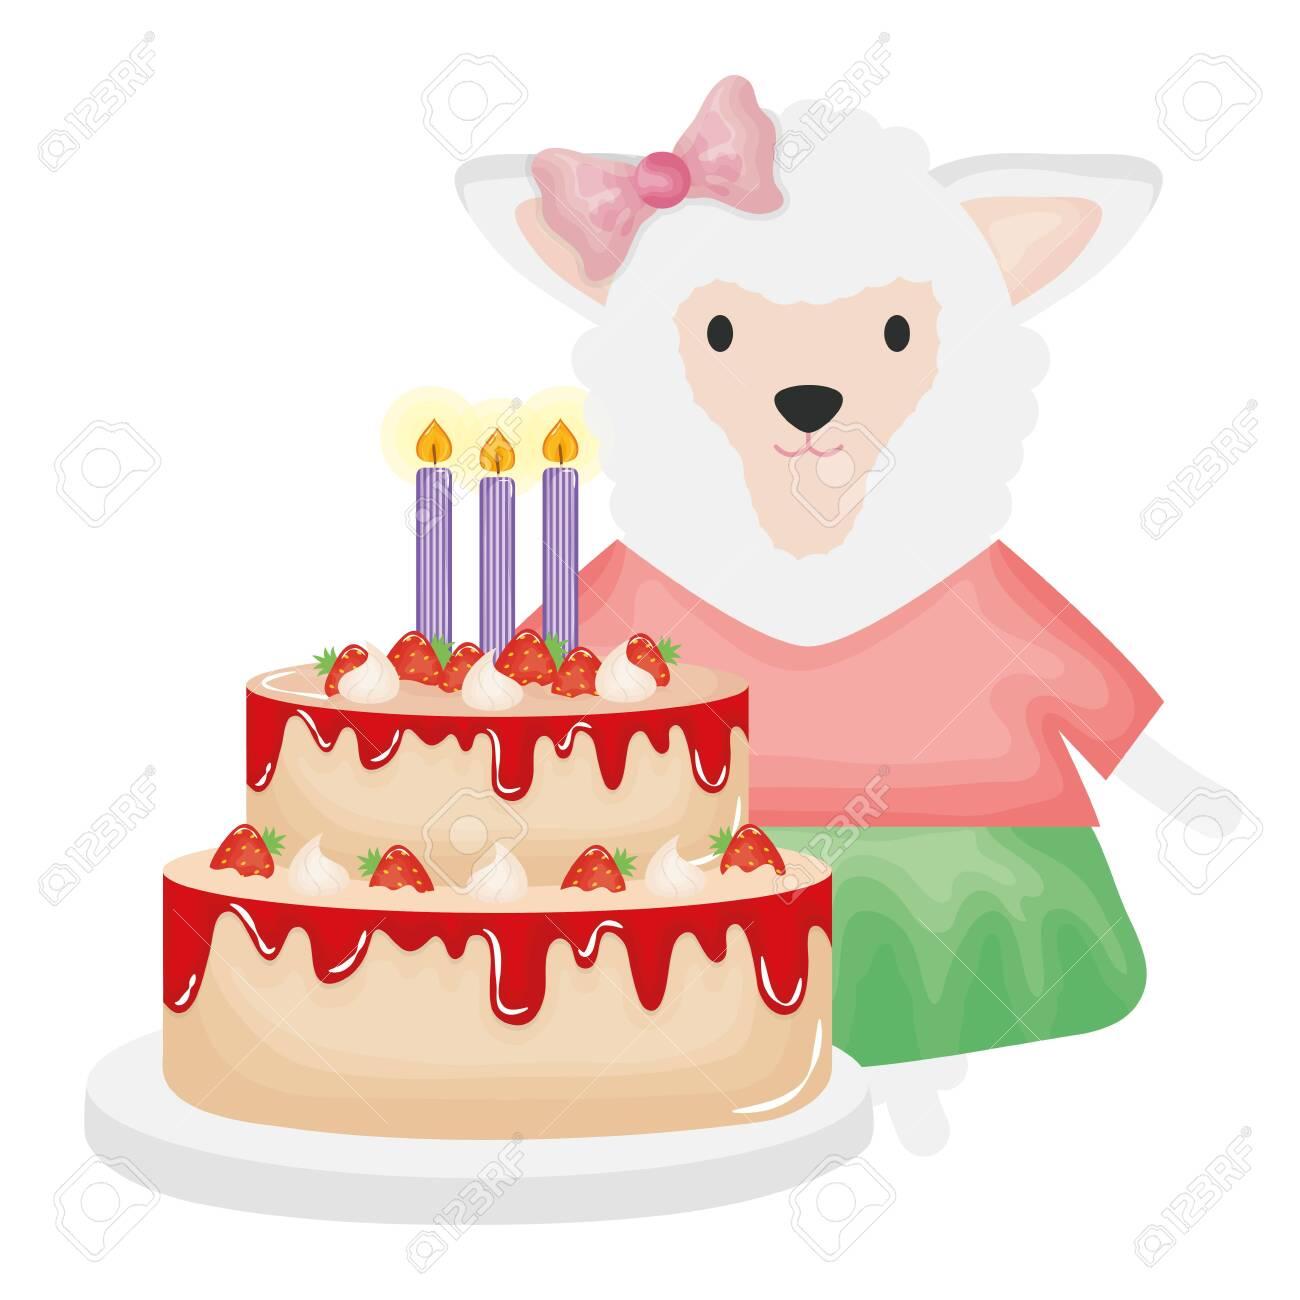 Sensational Cute Sheep With Sweet Cake In Birthday Party Vector Illustration Funny Birthday Cards Online Benoljebrpdamsfinfo